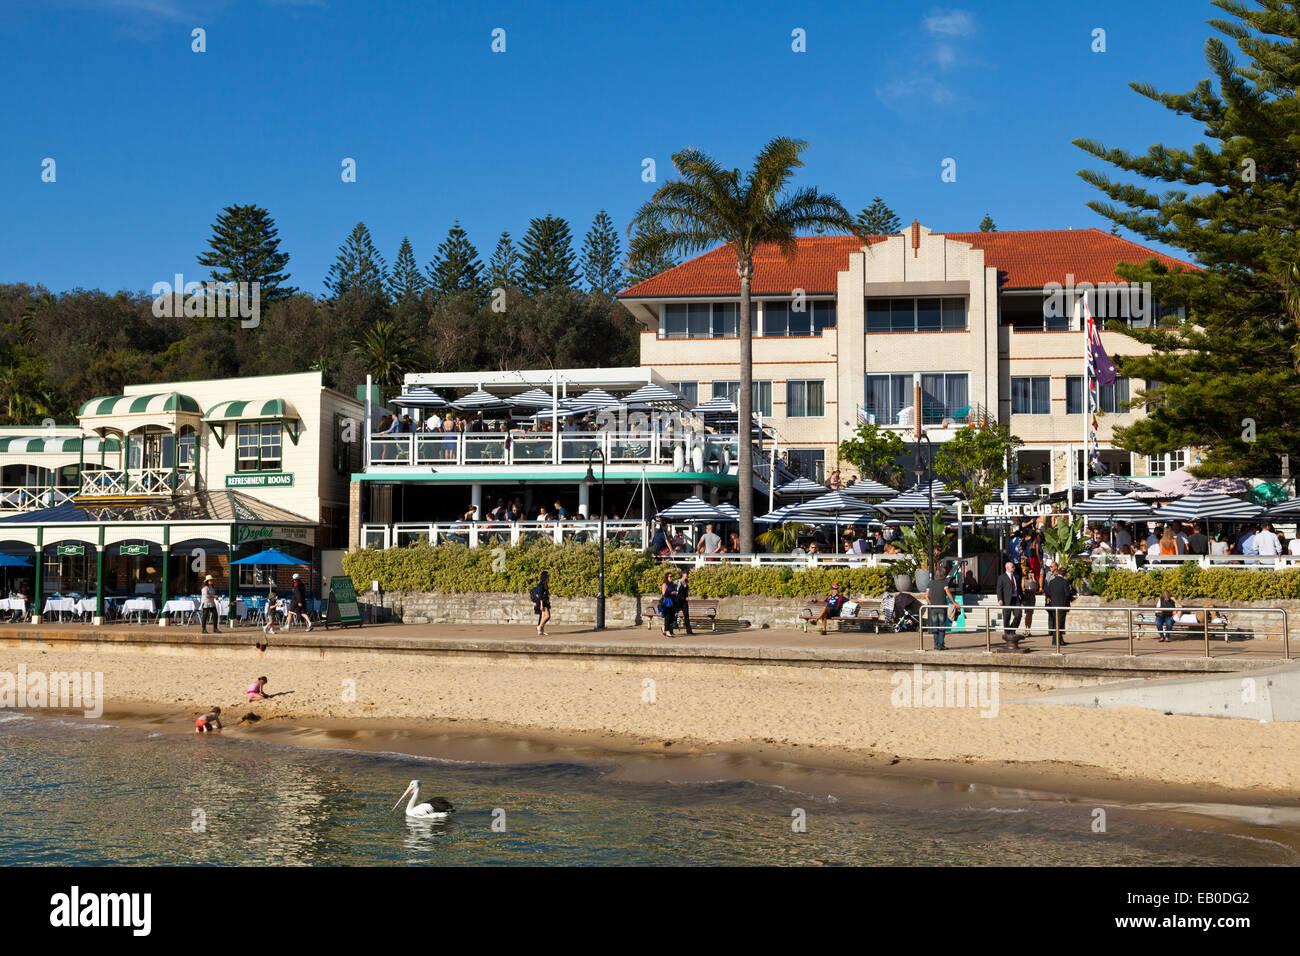 Watsons Bay Sydney NSW Australia - Stock Image